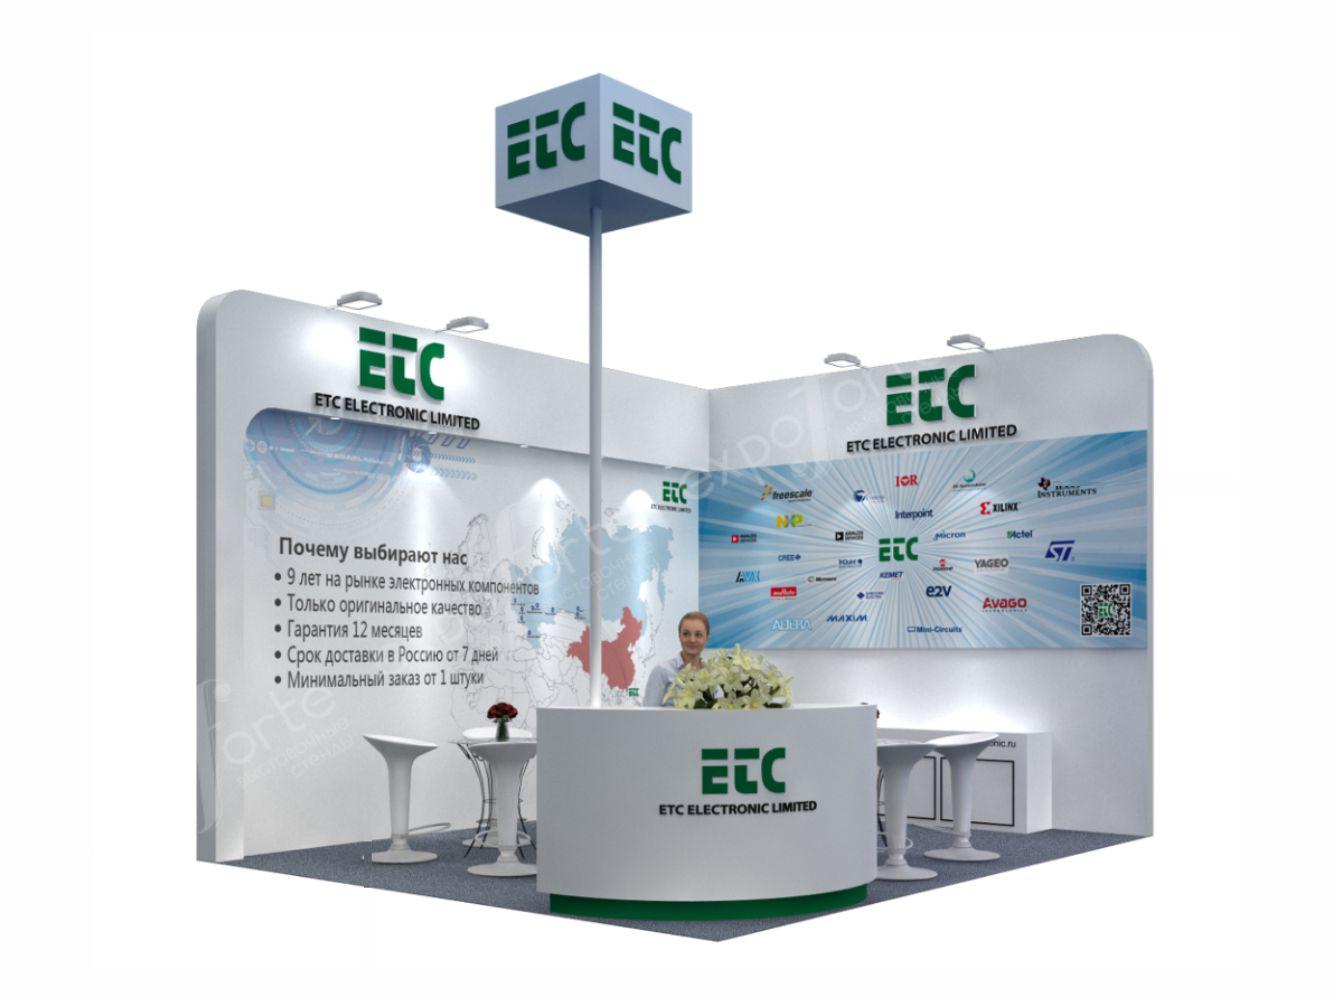 Фото: ETC, выставка ЭкспоЭлектроника – картинка 2